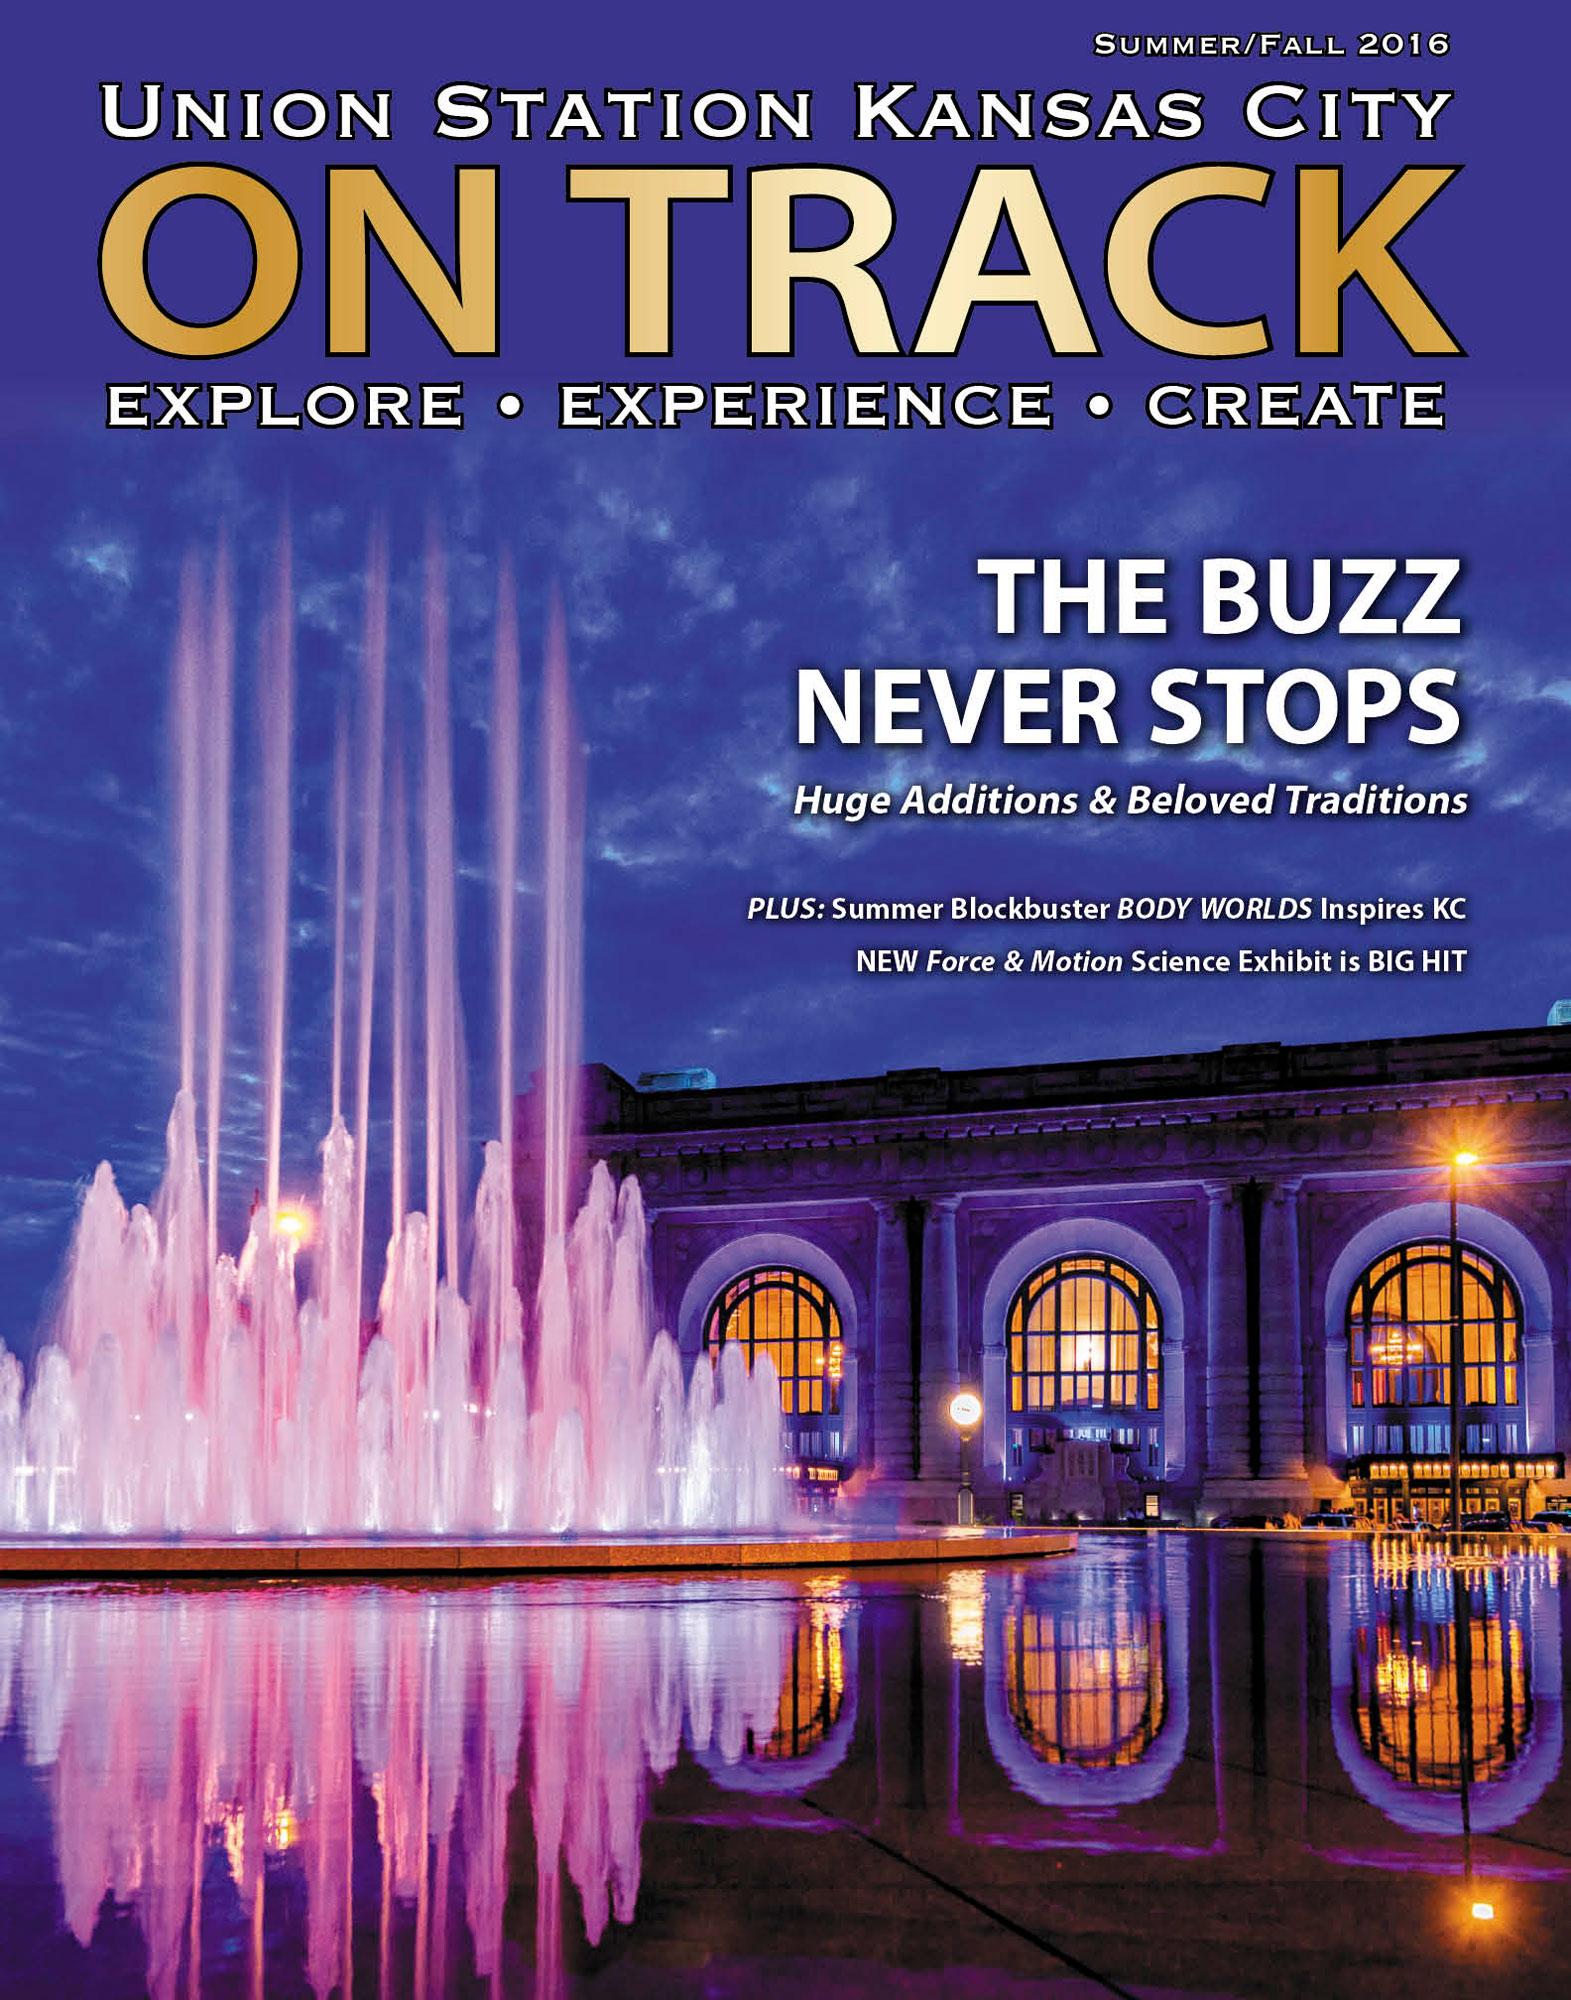 On Track Magazine